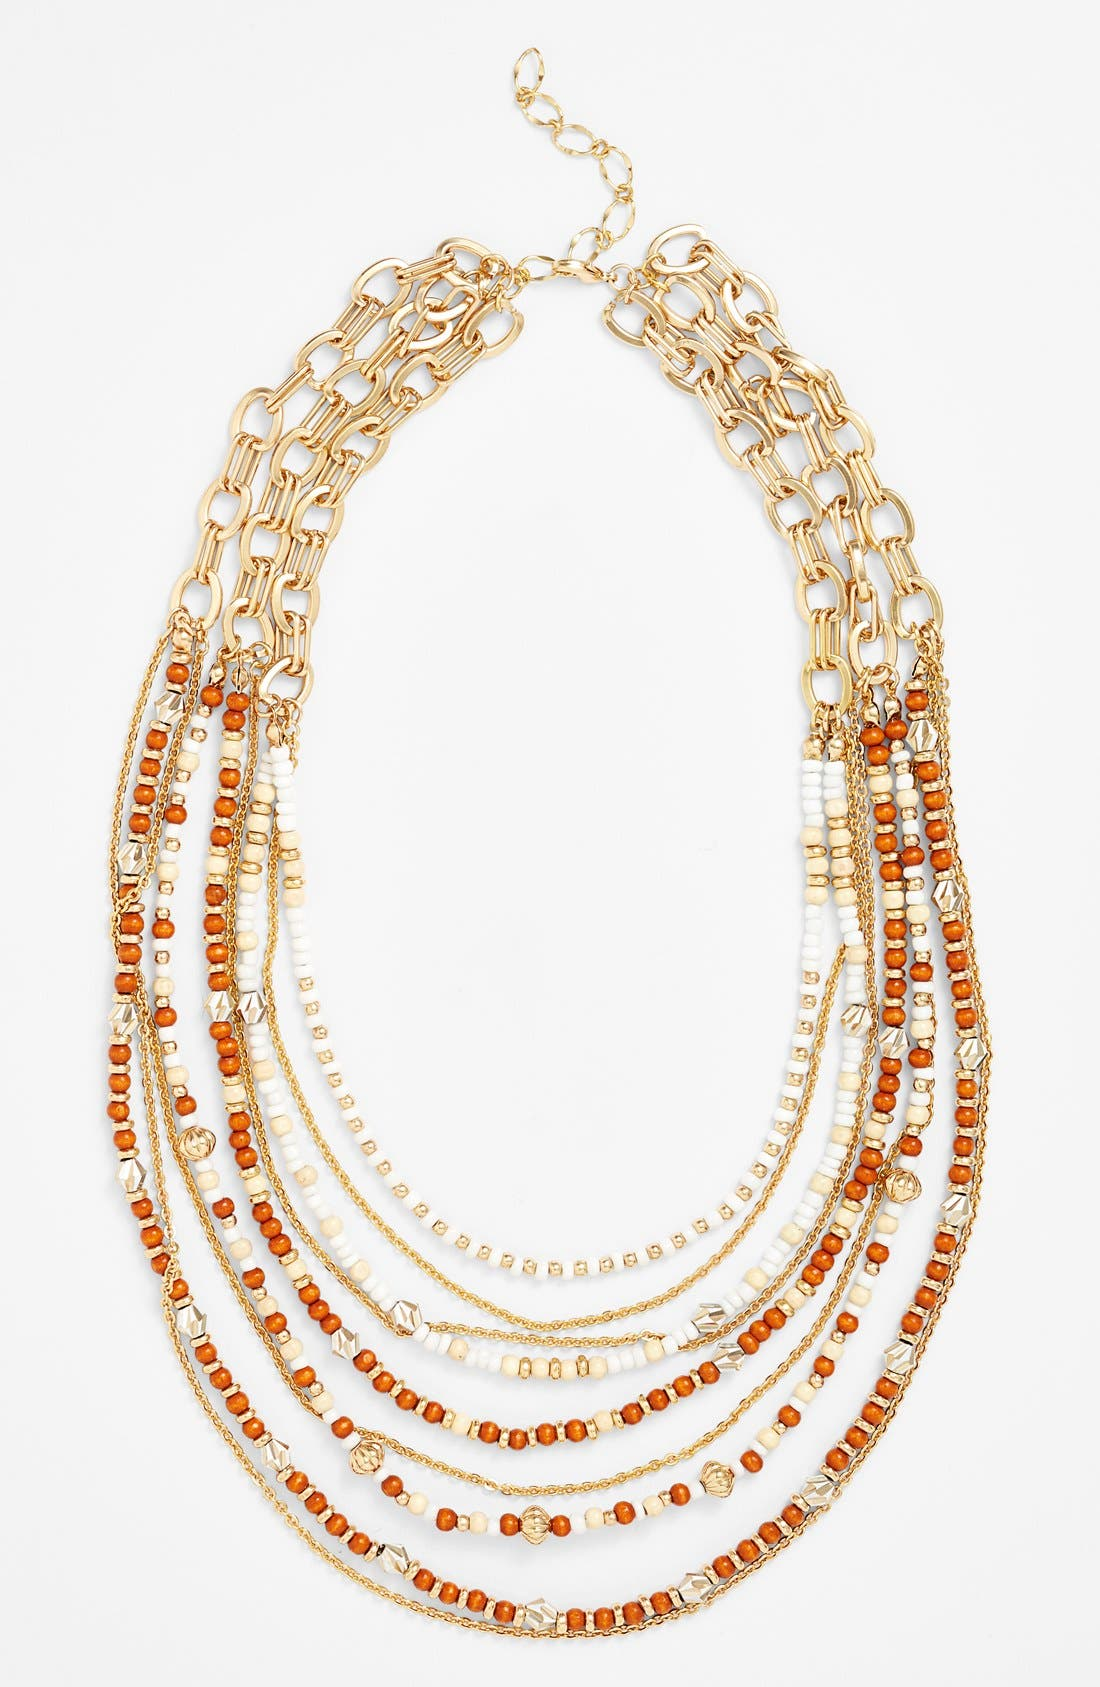 Main Image - Nordstrom 'Safari' Beaded Layered Necklace